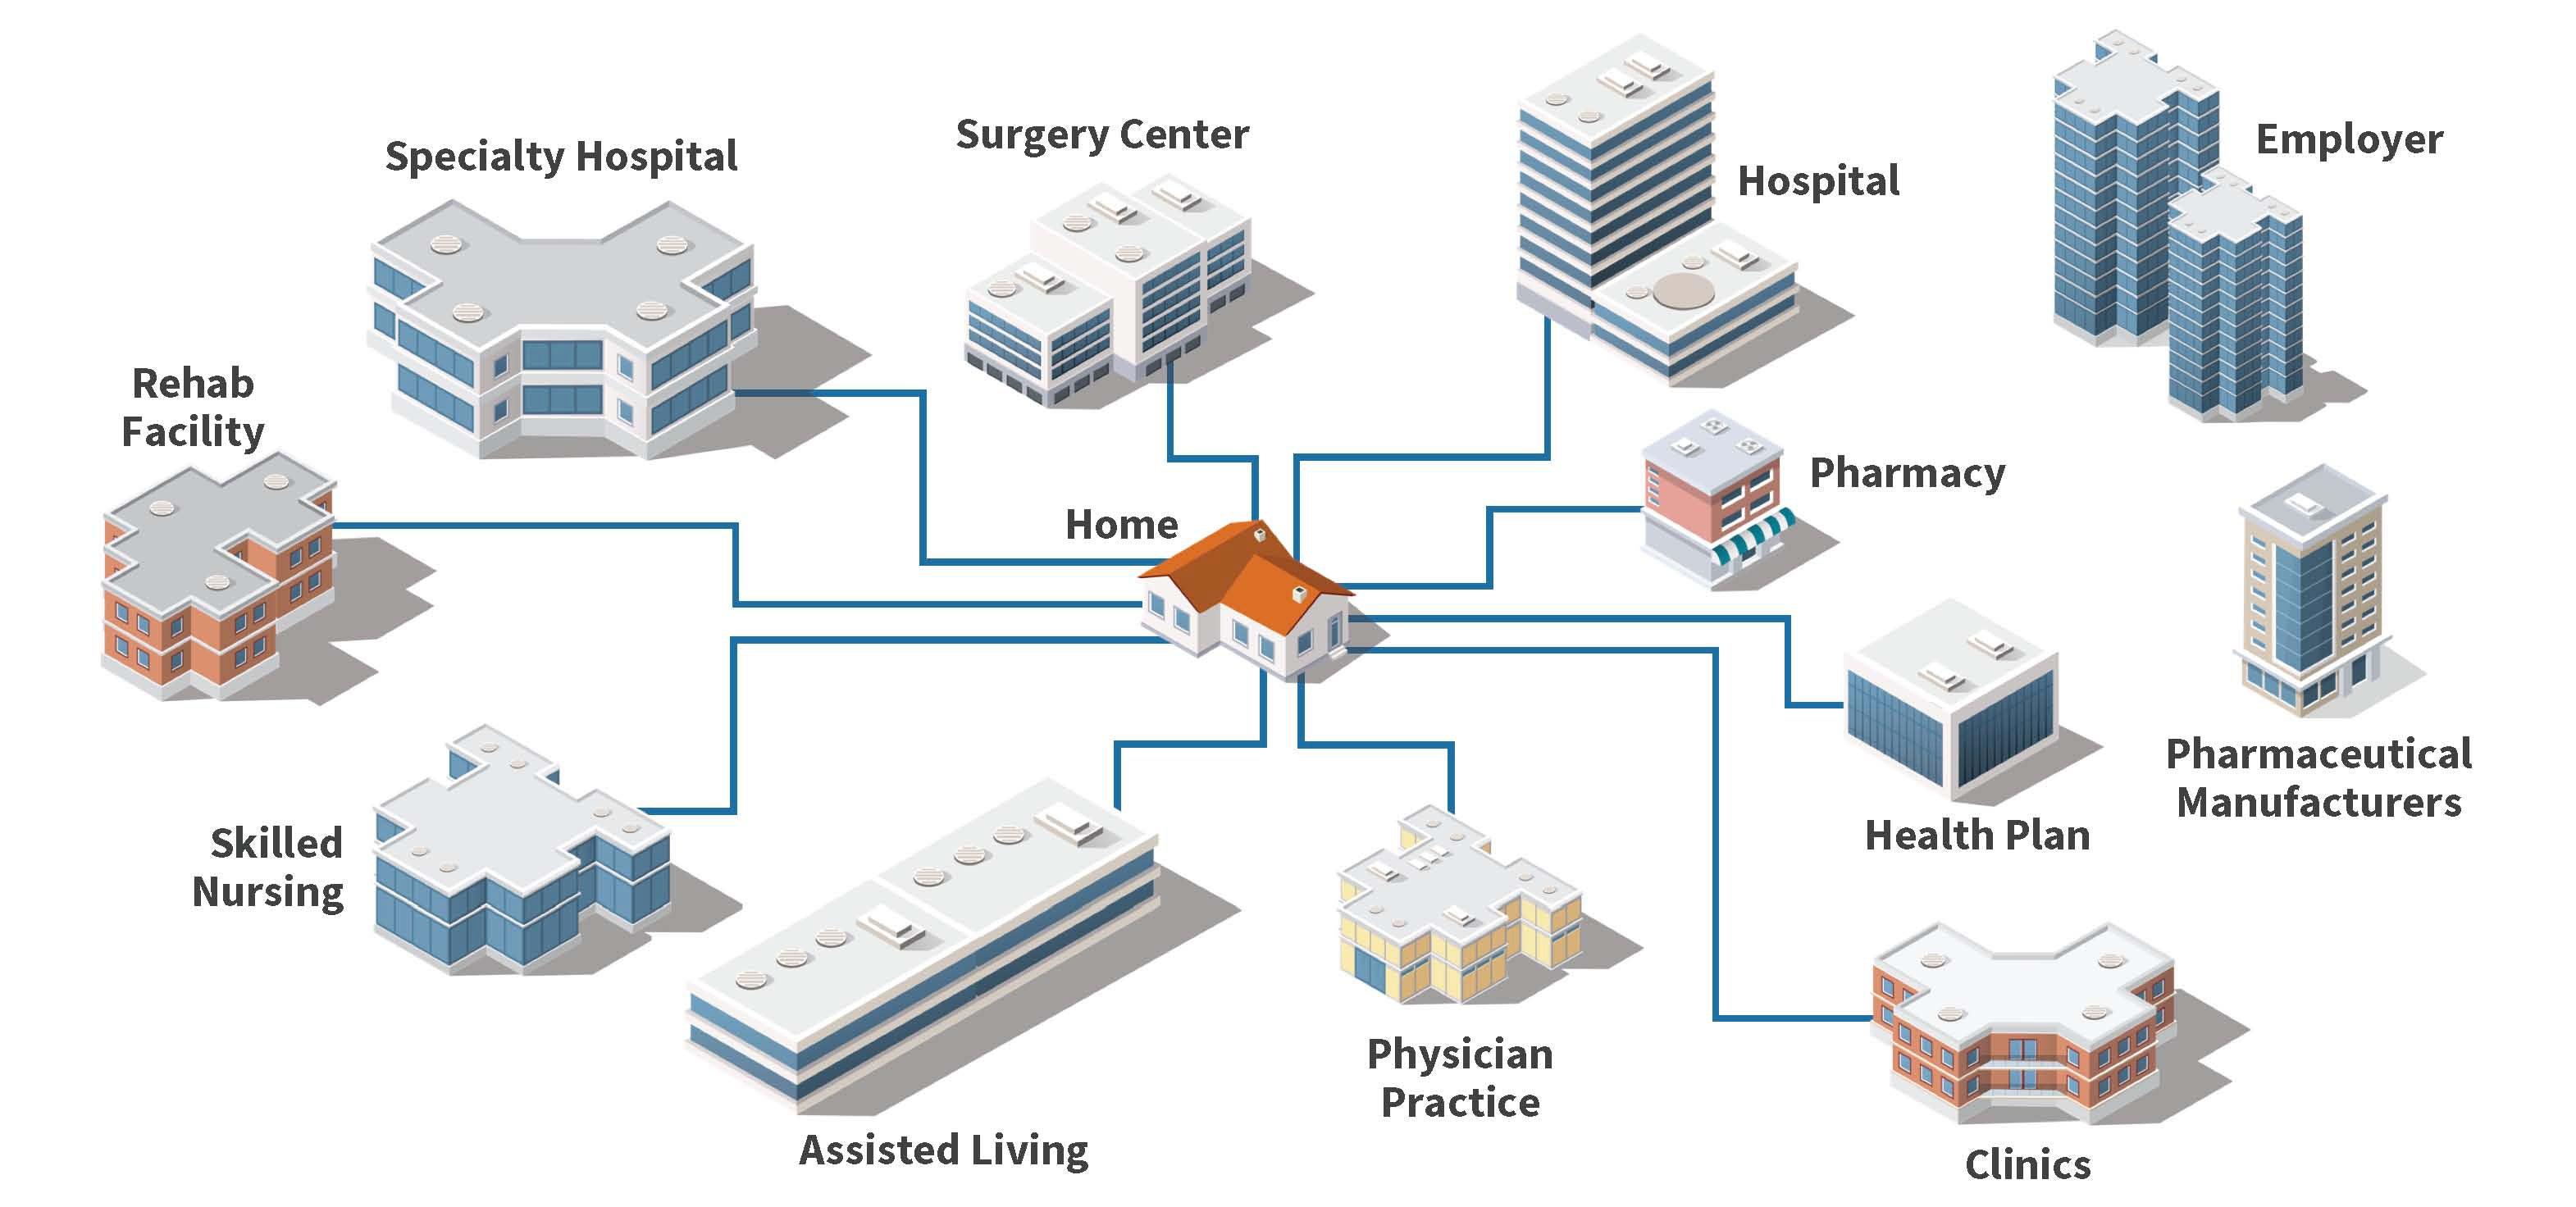 Healthcare Provider | LexisNexis Risk Solutions